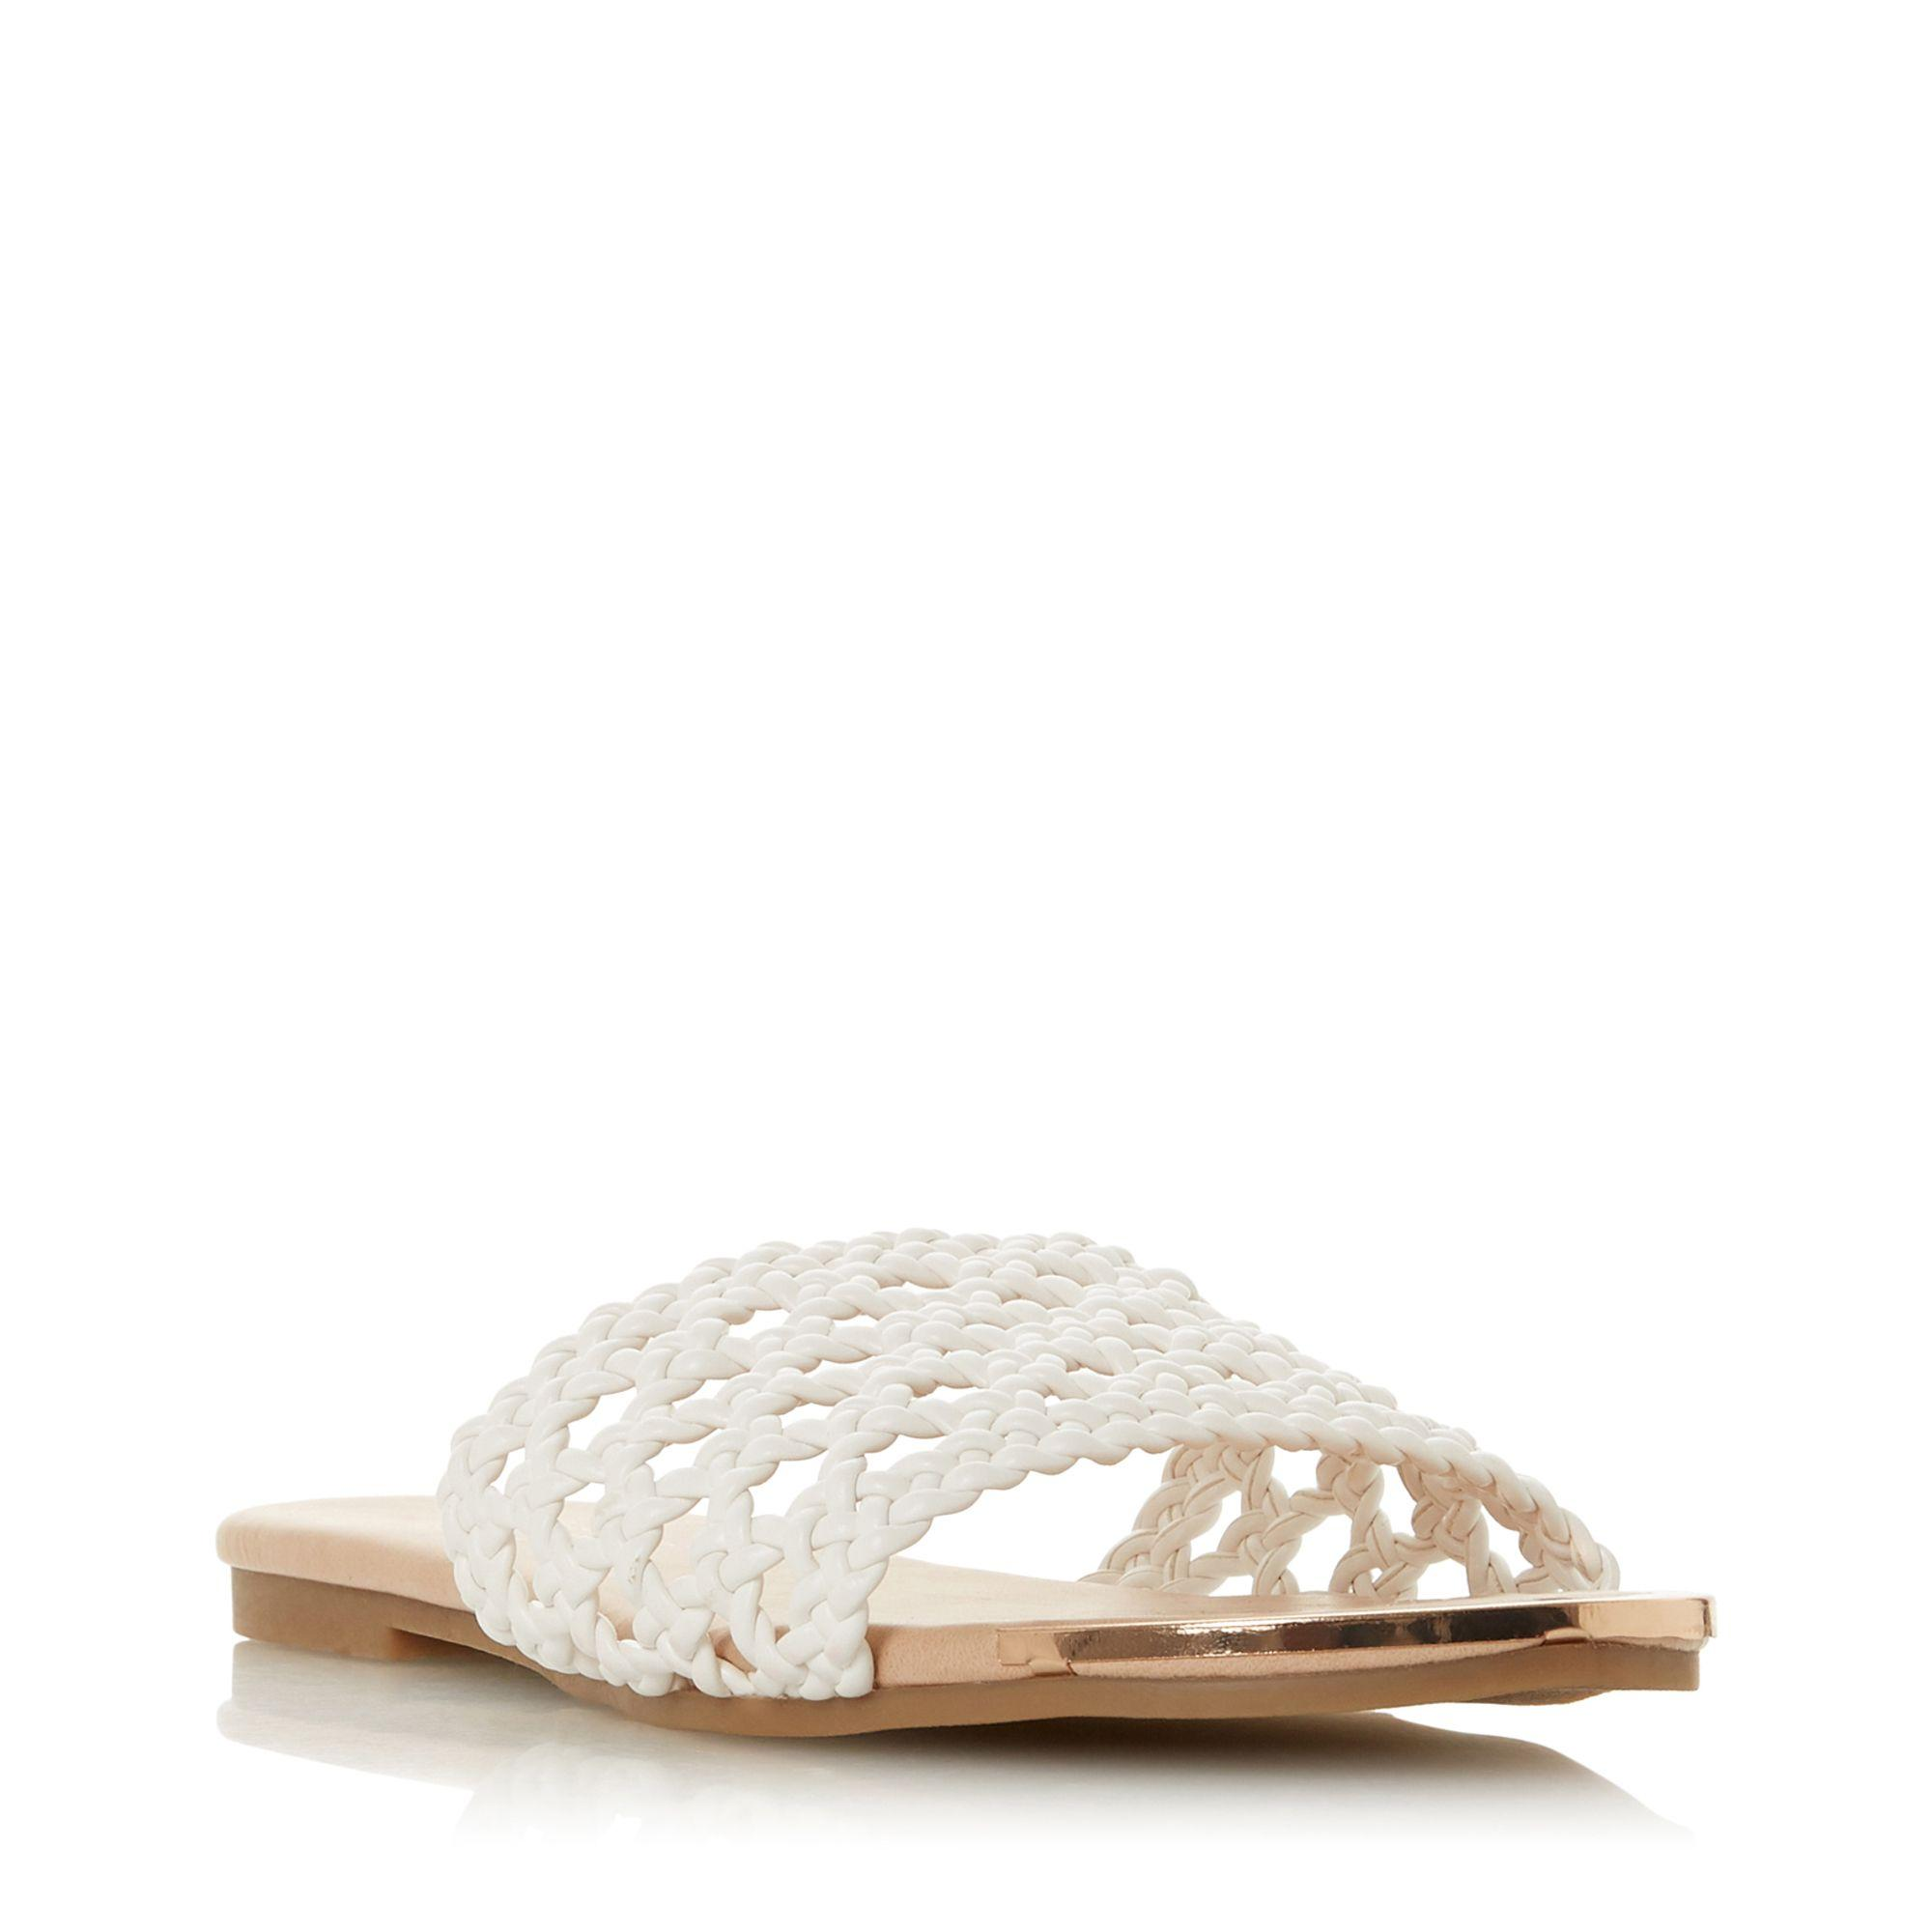 9175e209805 Dune White  leeo  Mule Sandals in White - Lyst